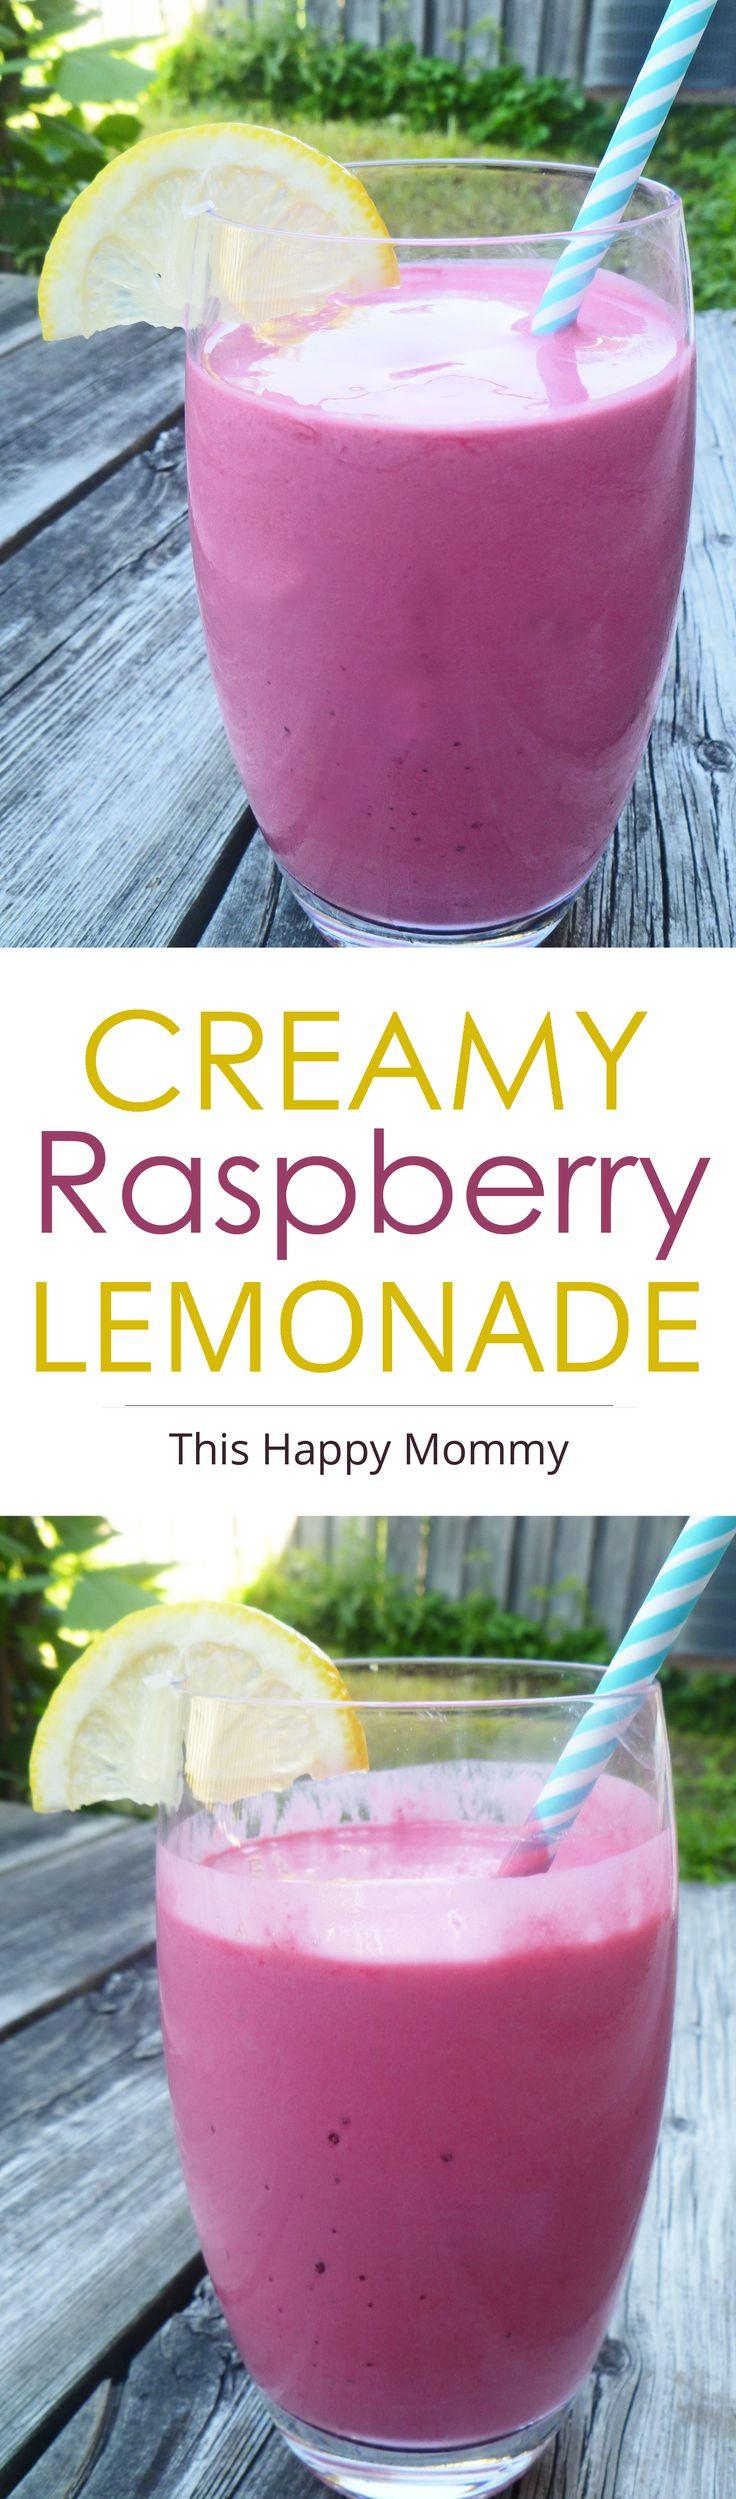 Creamy Raspberry Lemonade -- Tart, sweet, and bursting with creamy raspberry lemon flavour. Creamy Raspberry Lemonade is a perfect summertime drink you can enjoy all season long.   thishappymommy.com